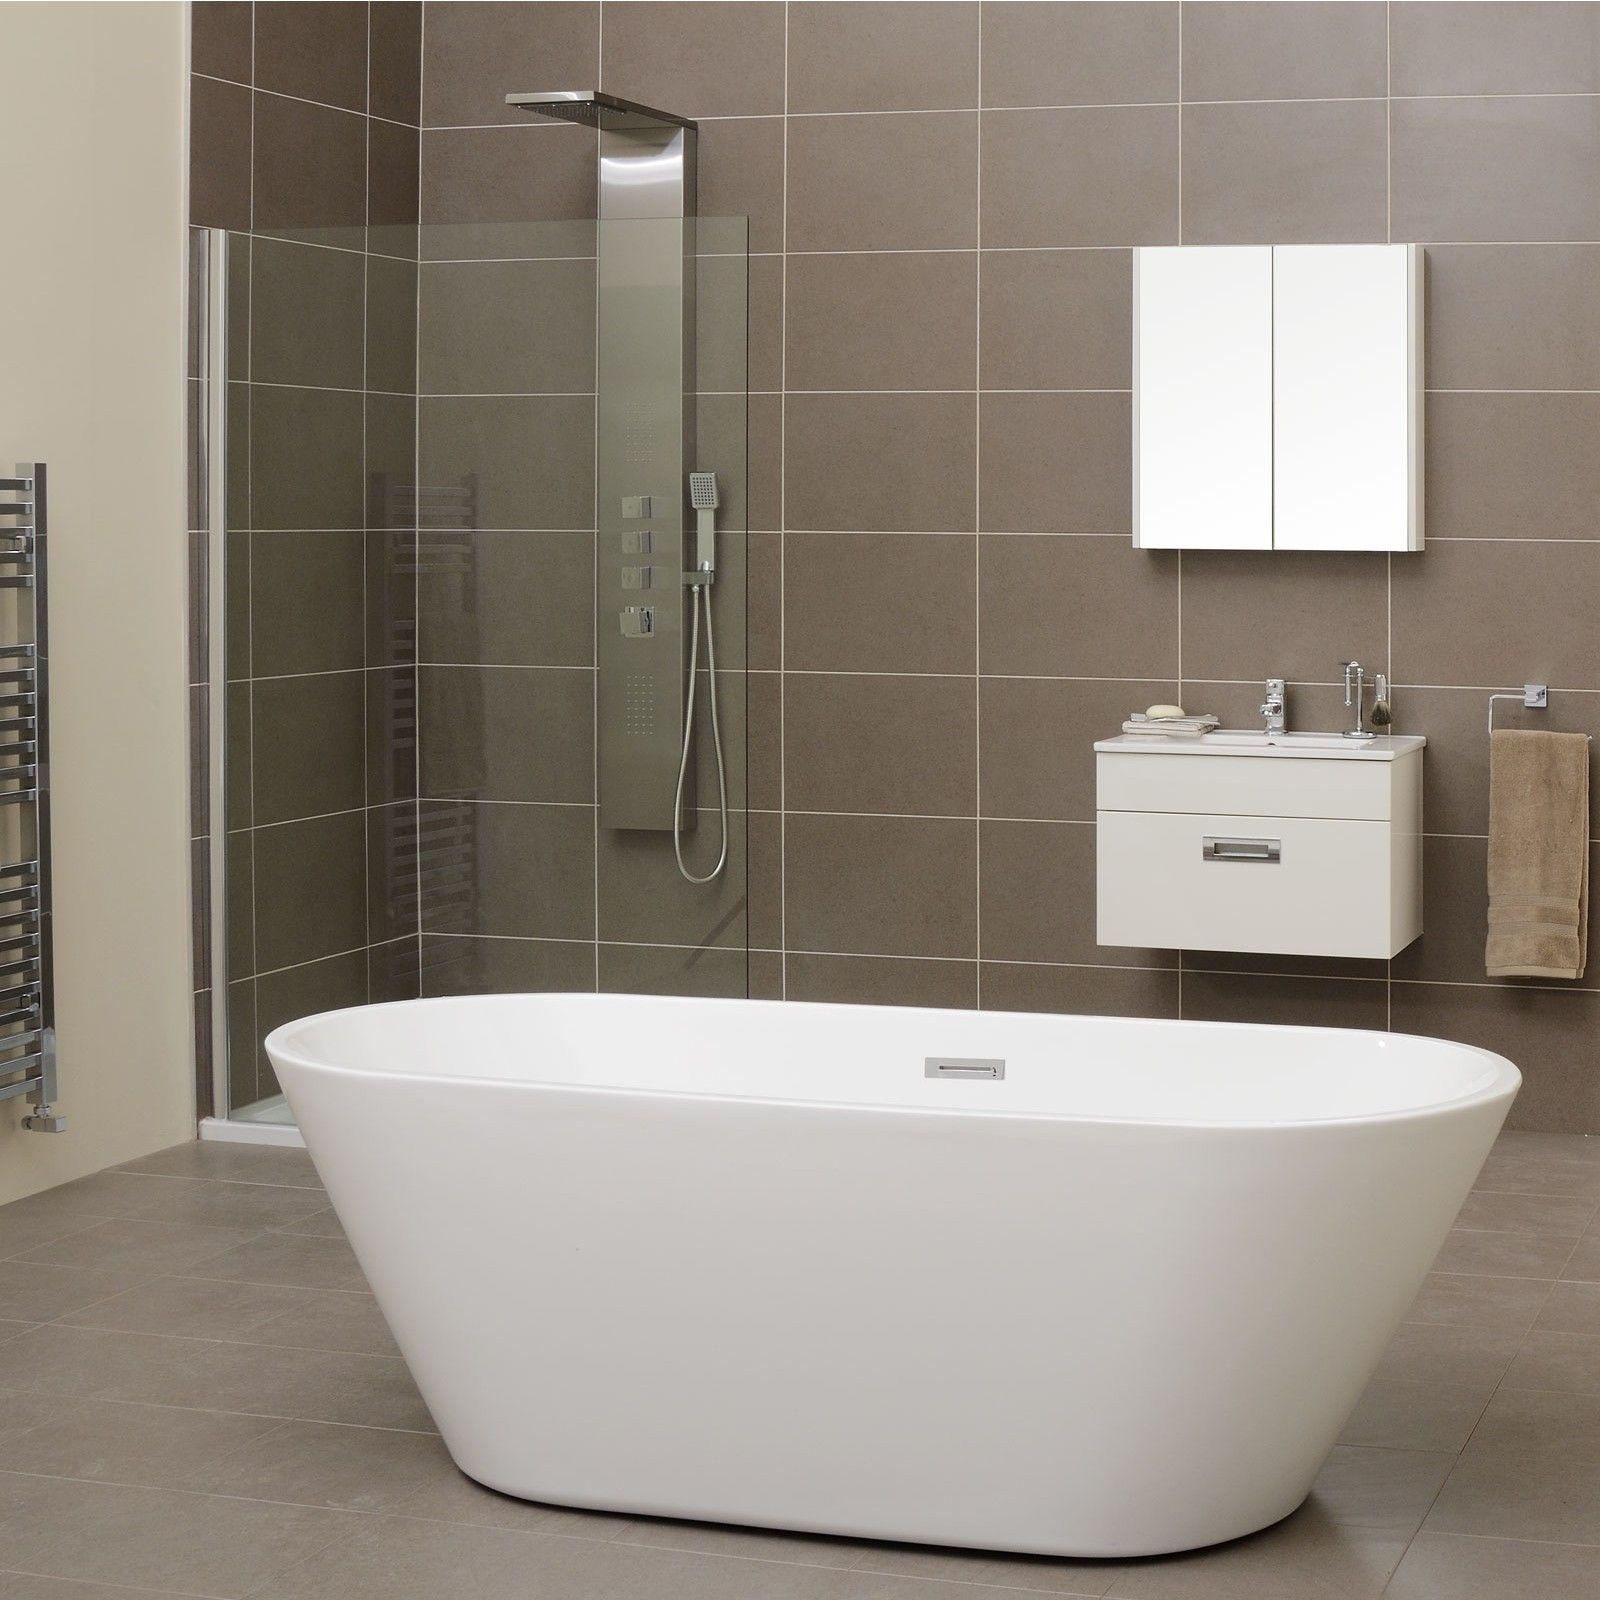 Marbella Gris Wall Tile Best Bathroom Tiles Amazing Bathrooms